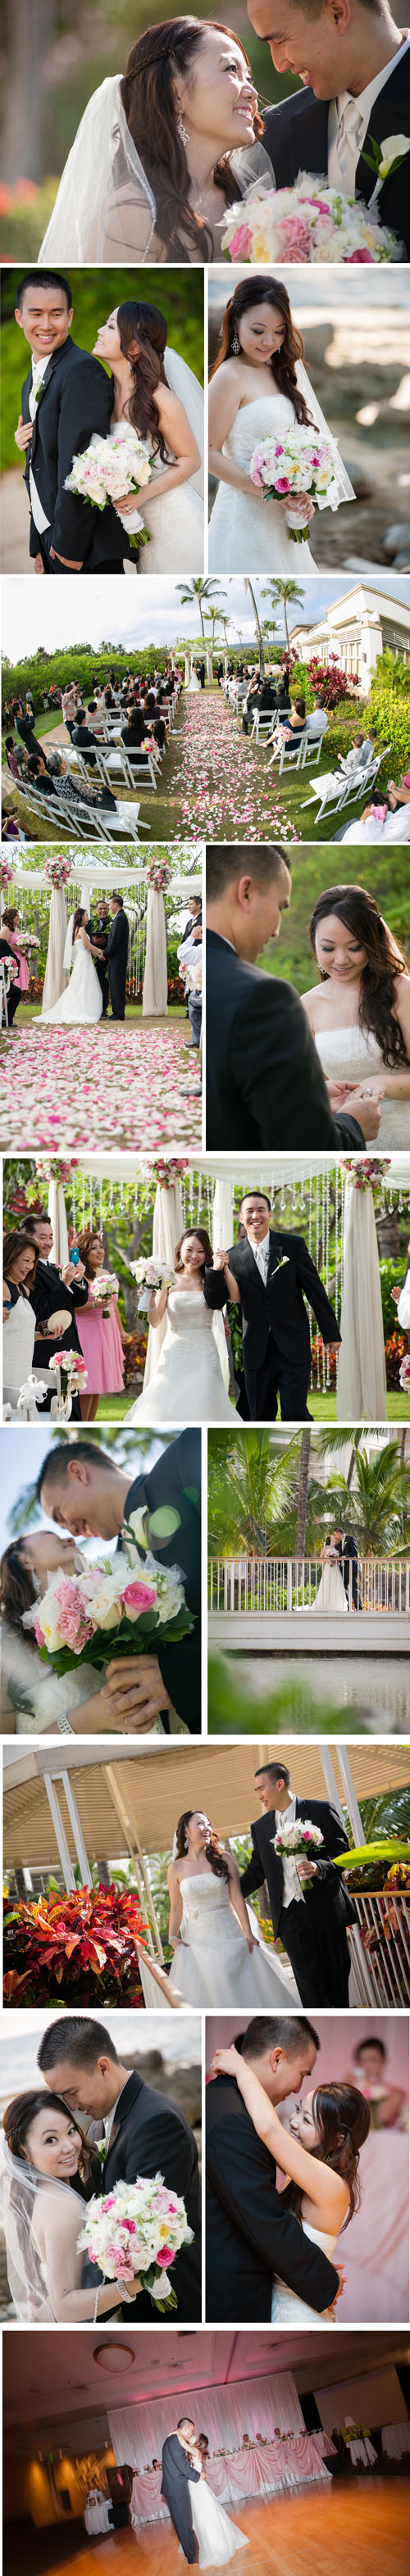 Hawaii Wedding Photographer Kai-Photo - Ihilani Wedding